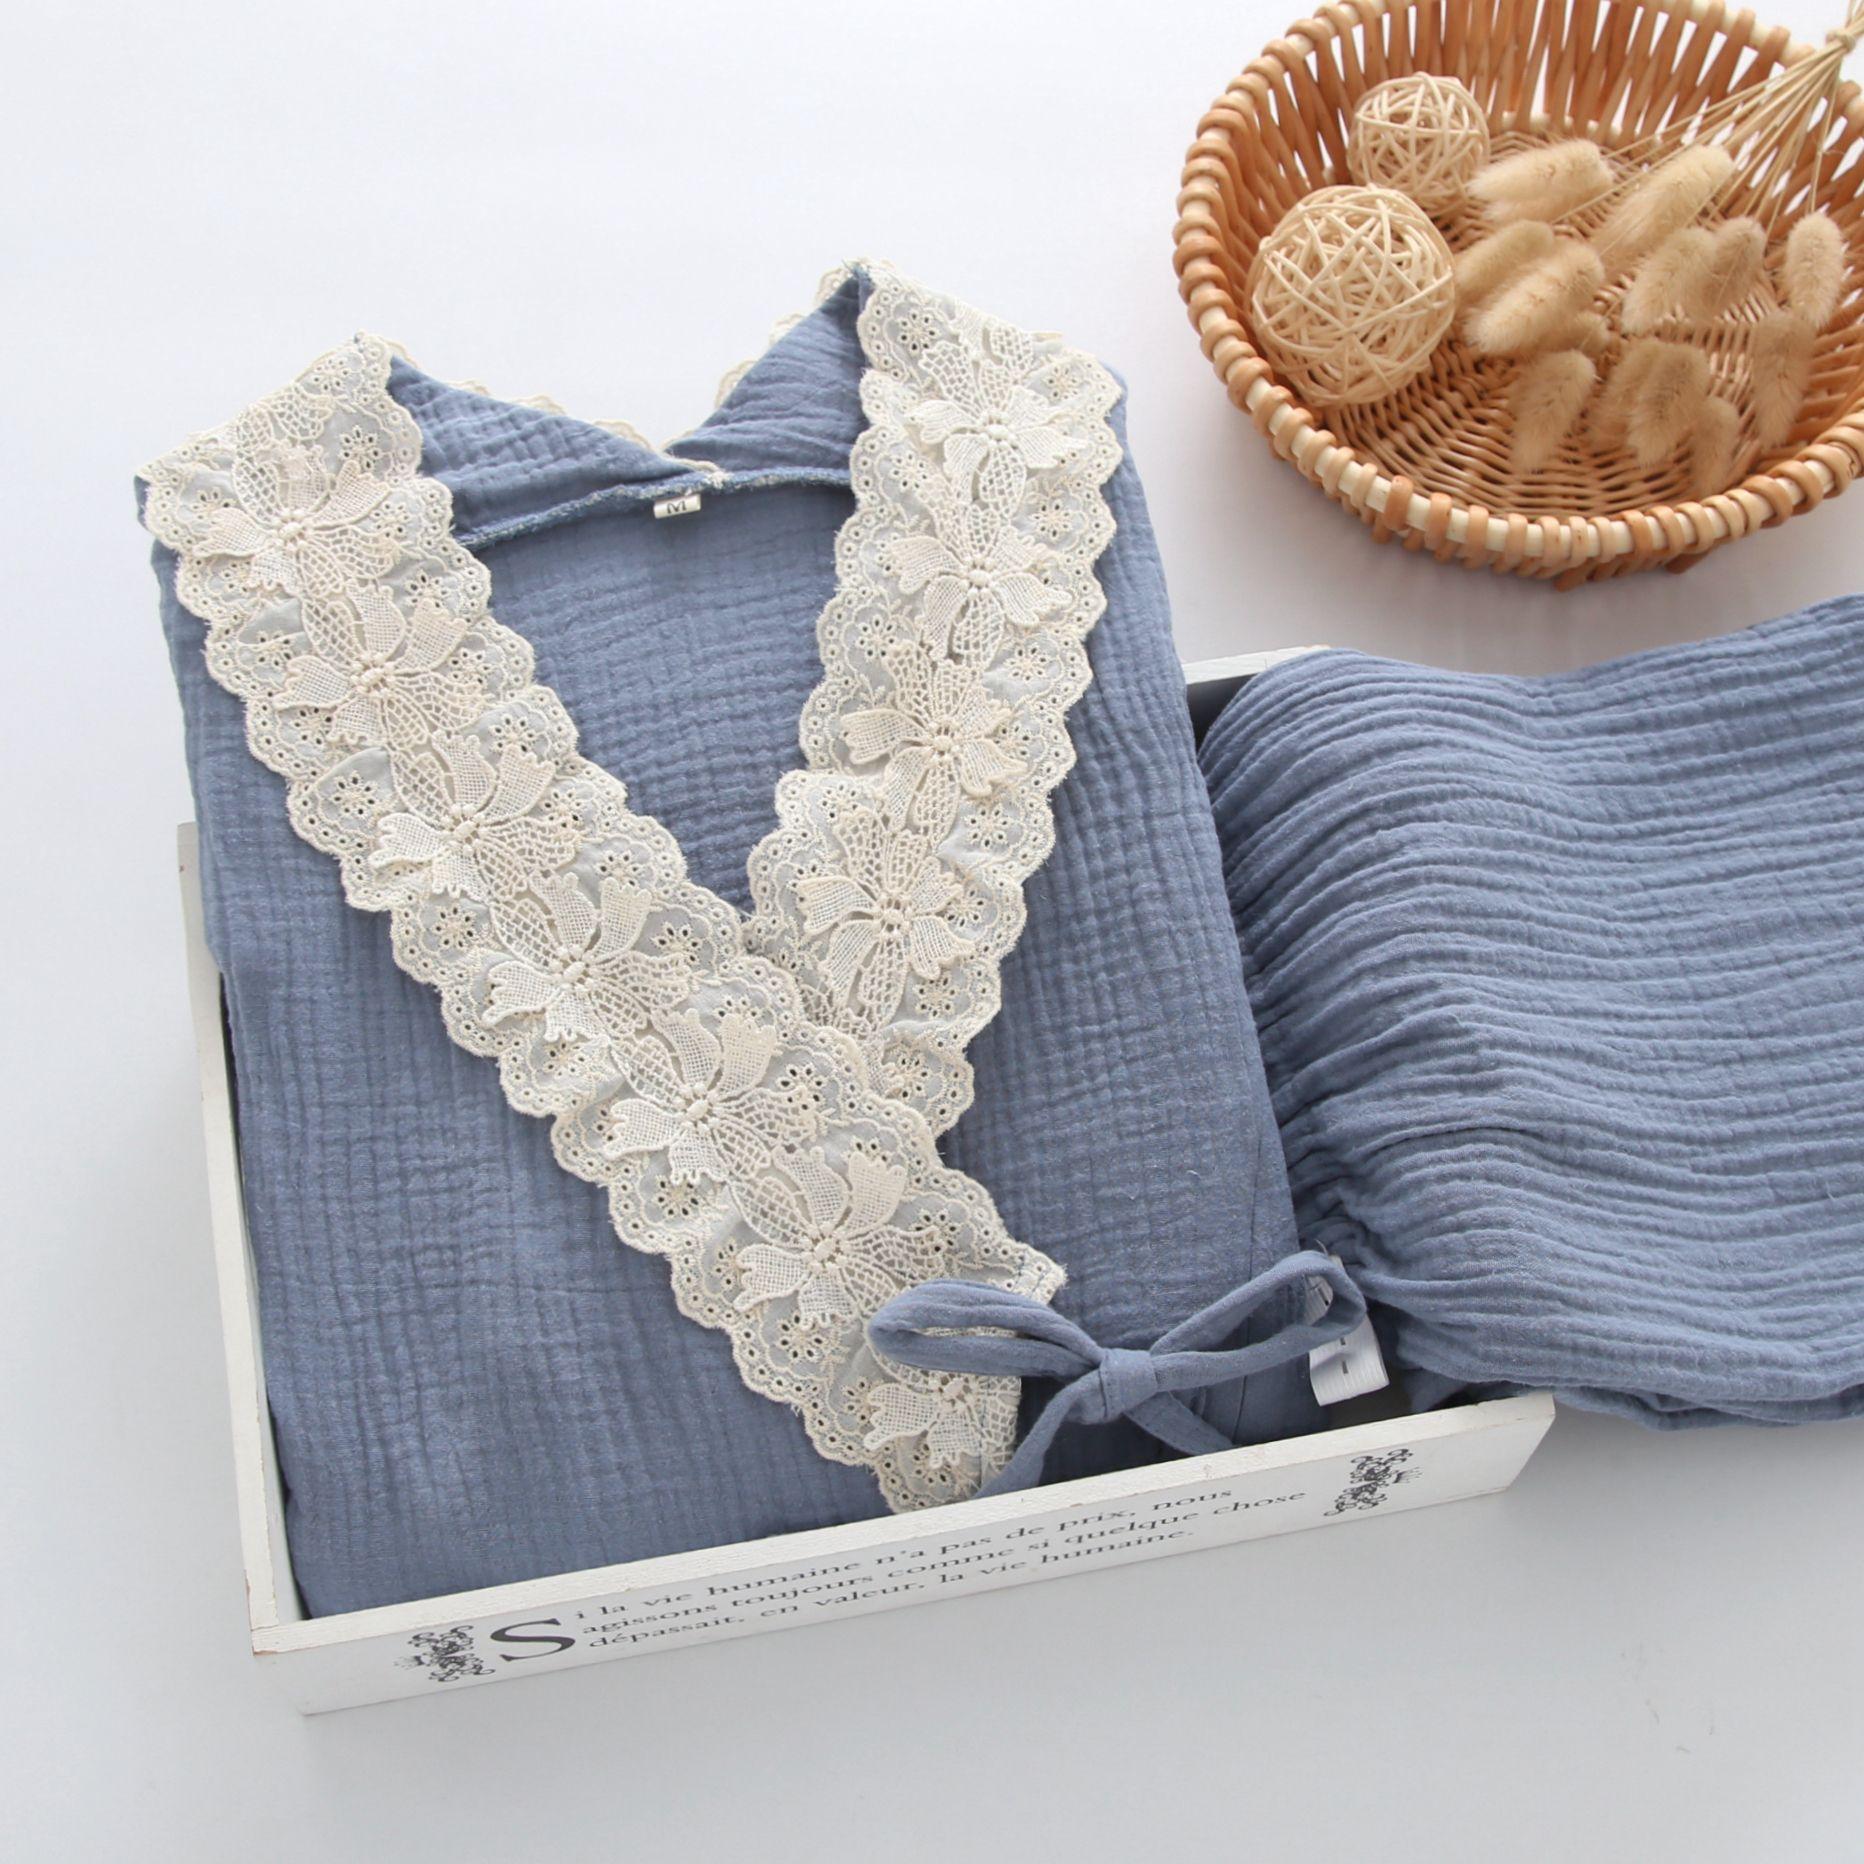 Fdfklak Cotton Maternity Nightie Nursing Pajama For Pregnant Women 2020 Spring Autumn Long Sleeve Lace Sleepwear Women enlarge